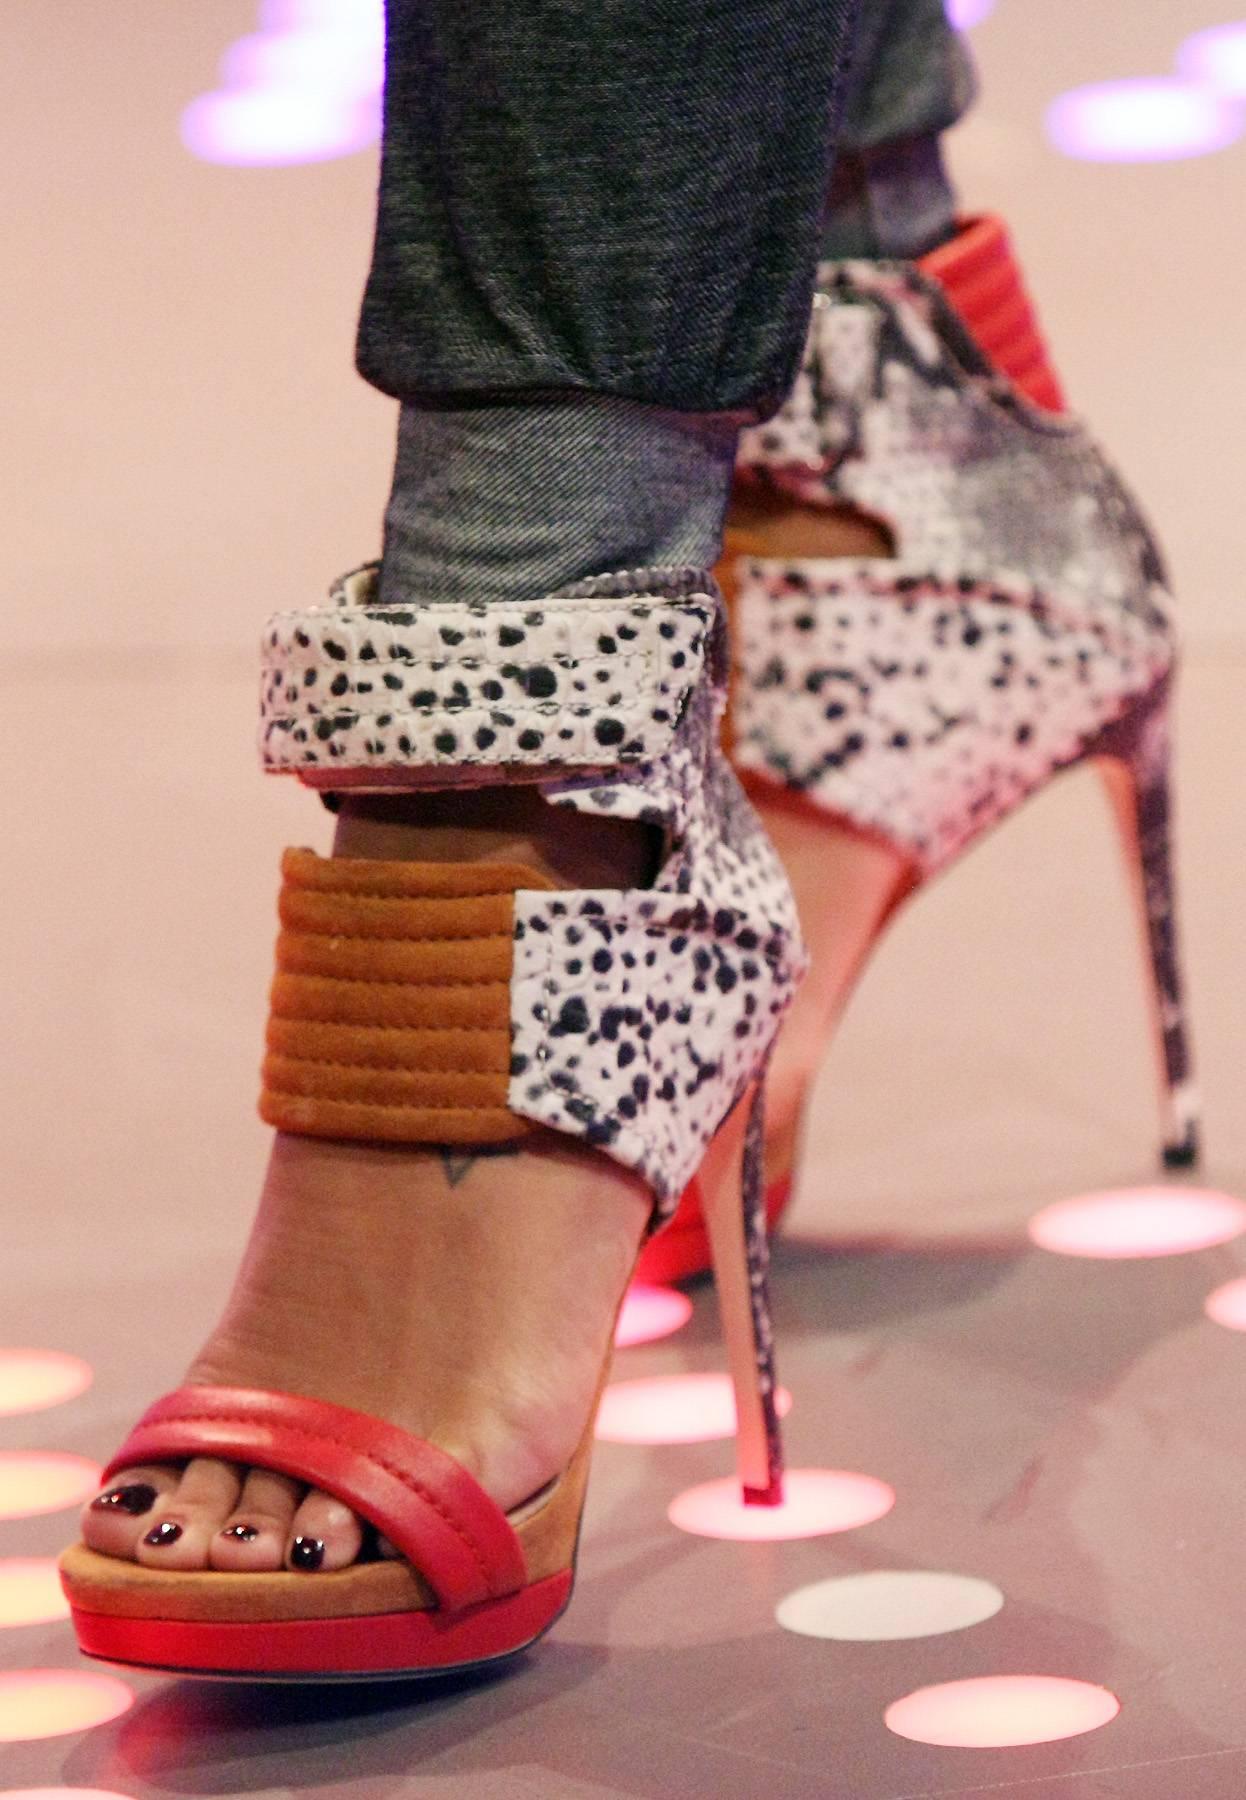 Skin to Skin - Angela Simmons wears some snake skin-inspired heels.(Photo: Bennett Raglin/BET/Getty Images for BET)